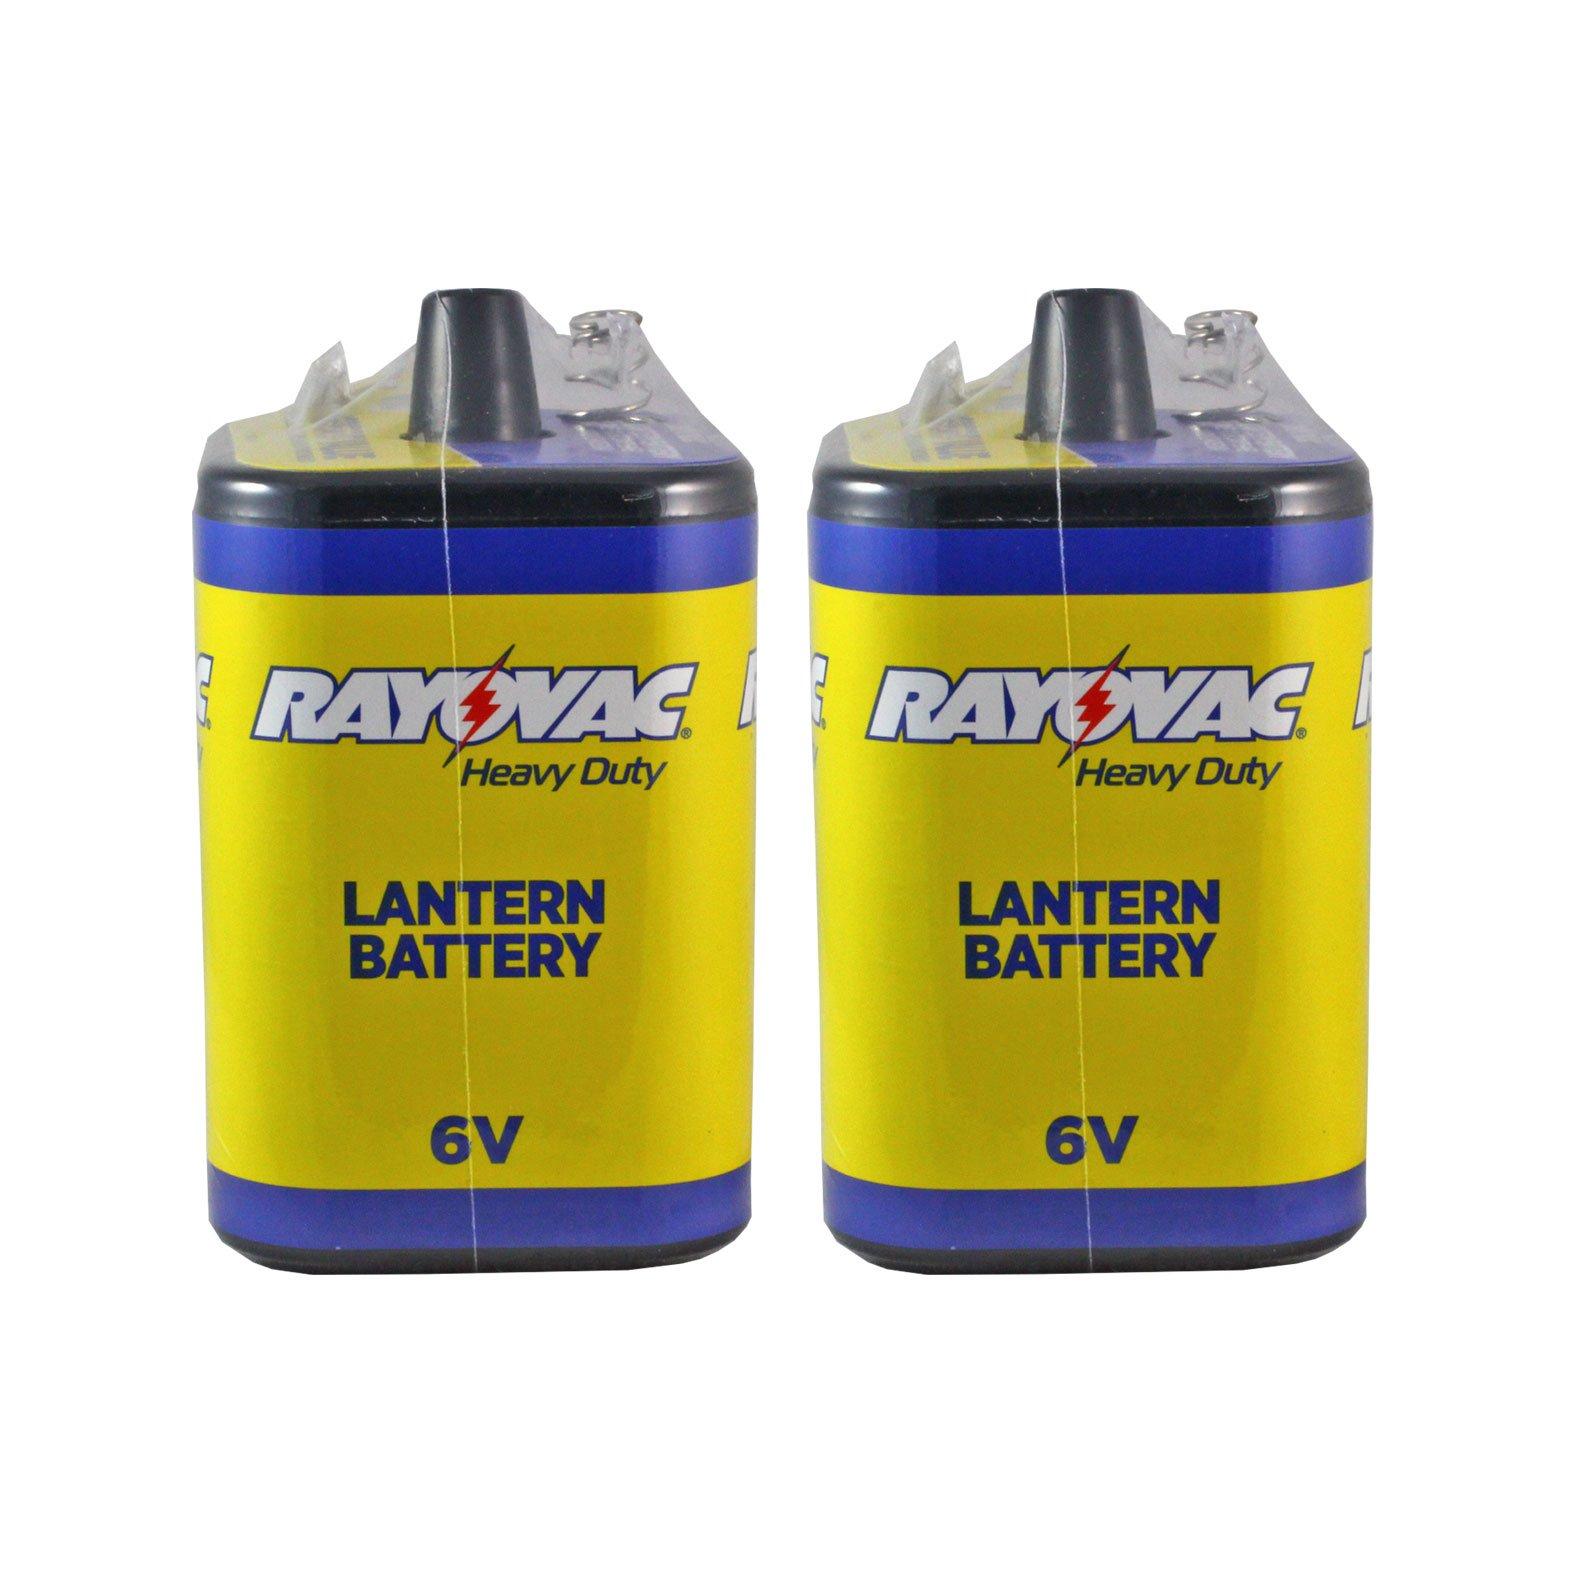 Rayovac 6 Volt Heavy Duty Lantern Battery 2 Pack